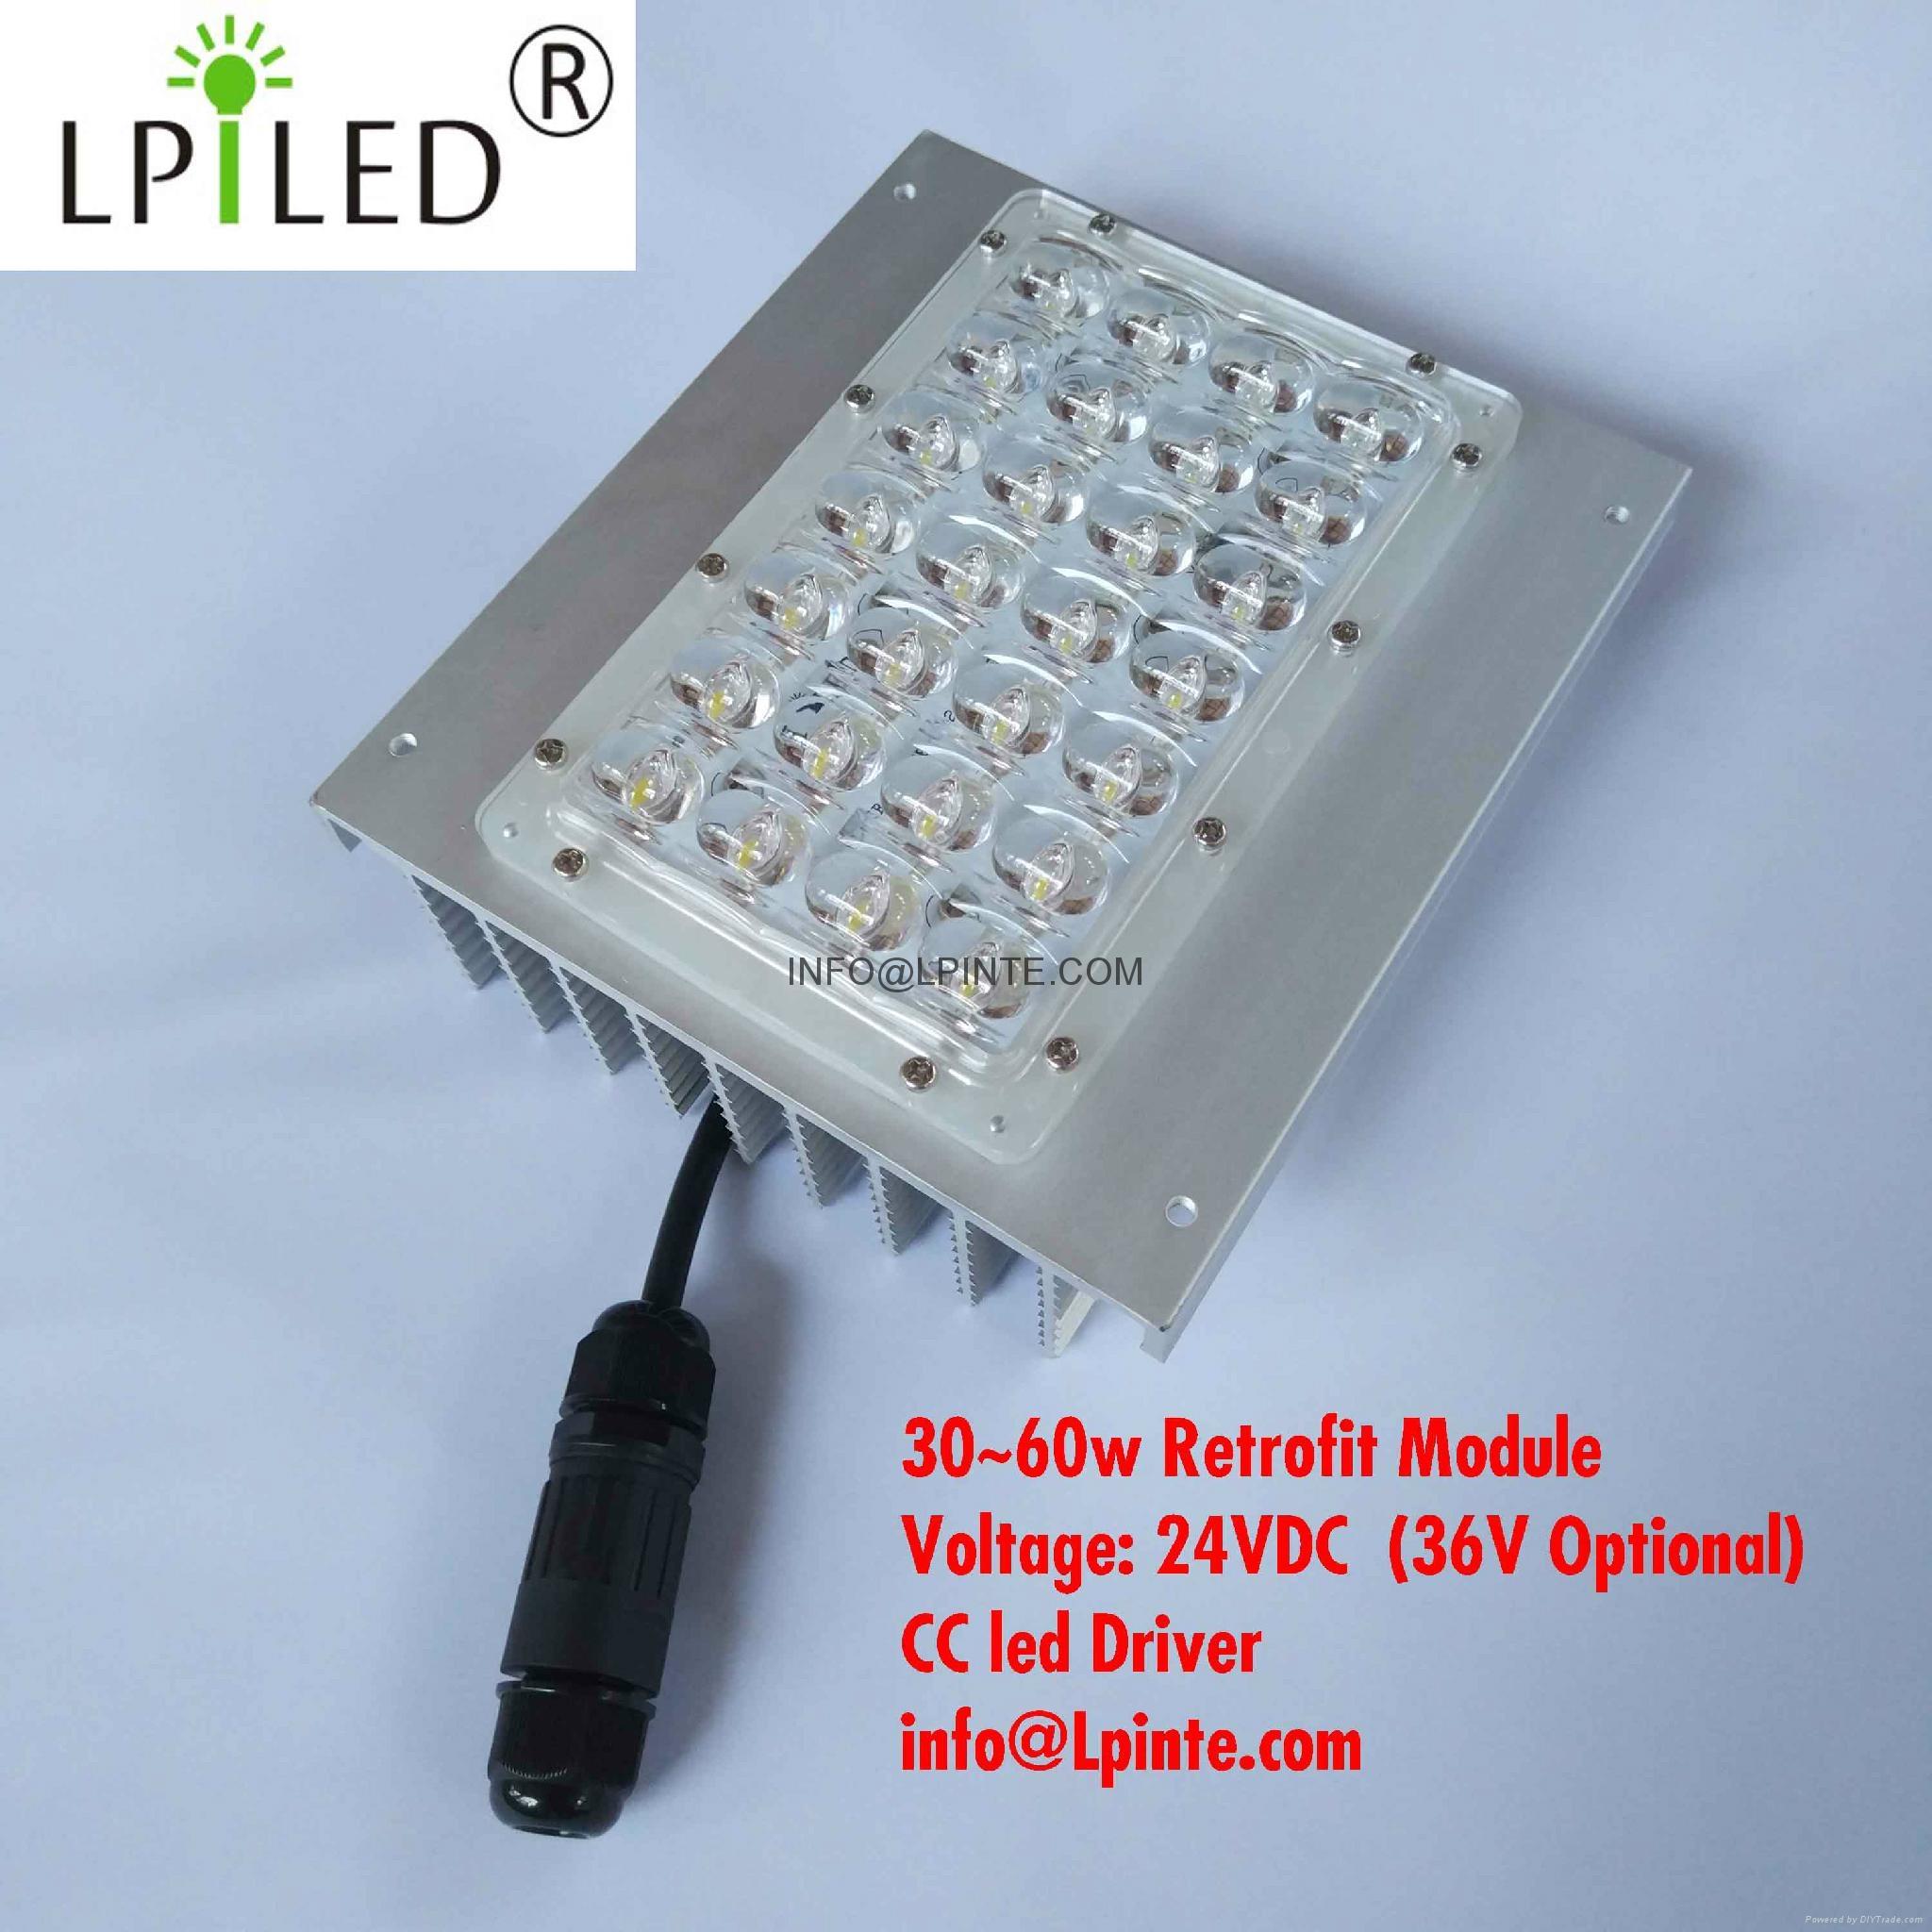 28w led card LV2412 steetlight module 1